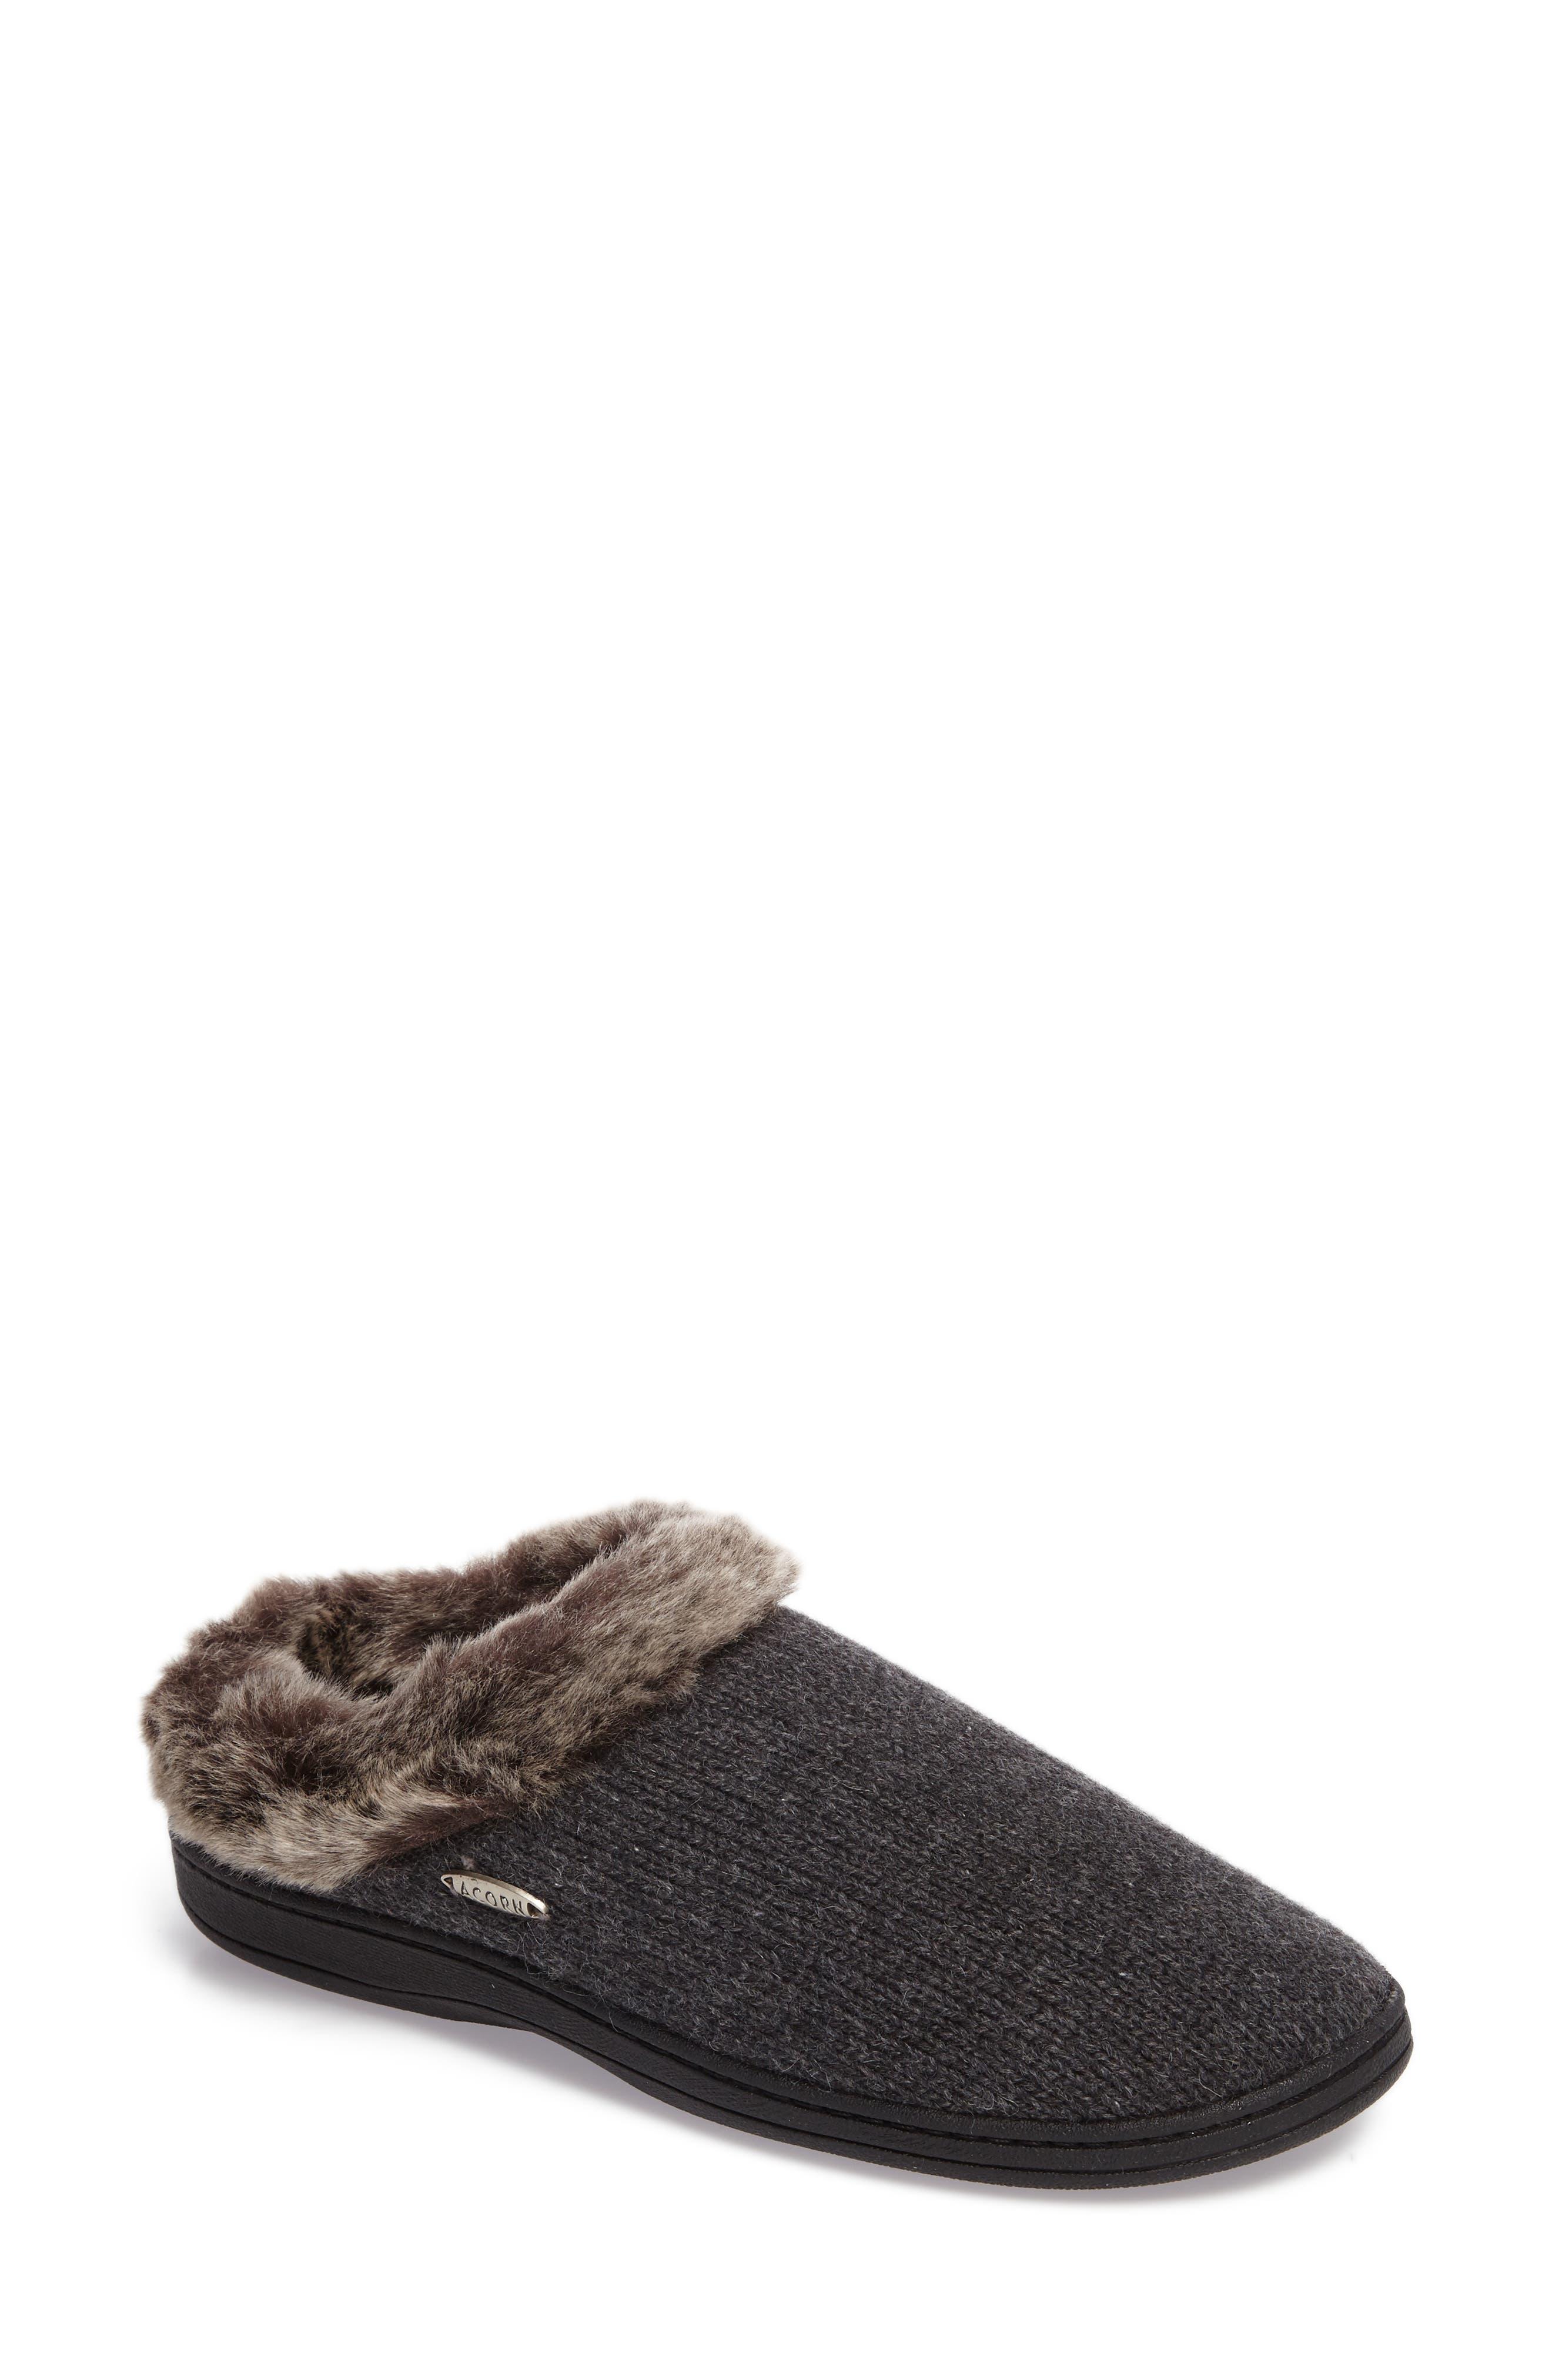 Chinchilla Faux Fur Slipper,                             Main thumbnail 1, color,                             Dark Charcoal Heather